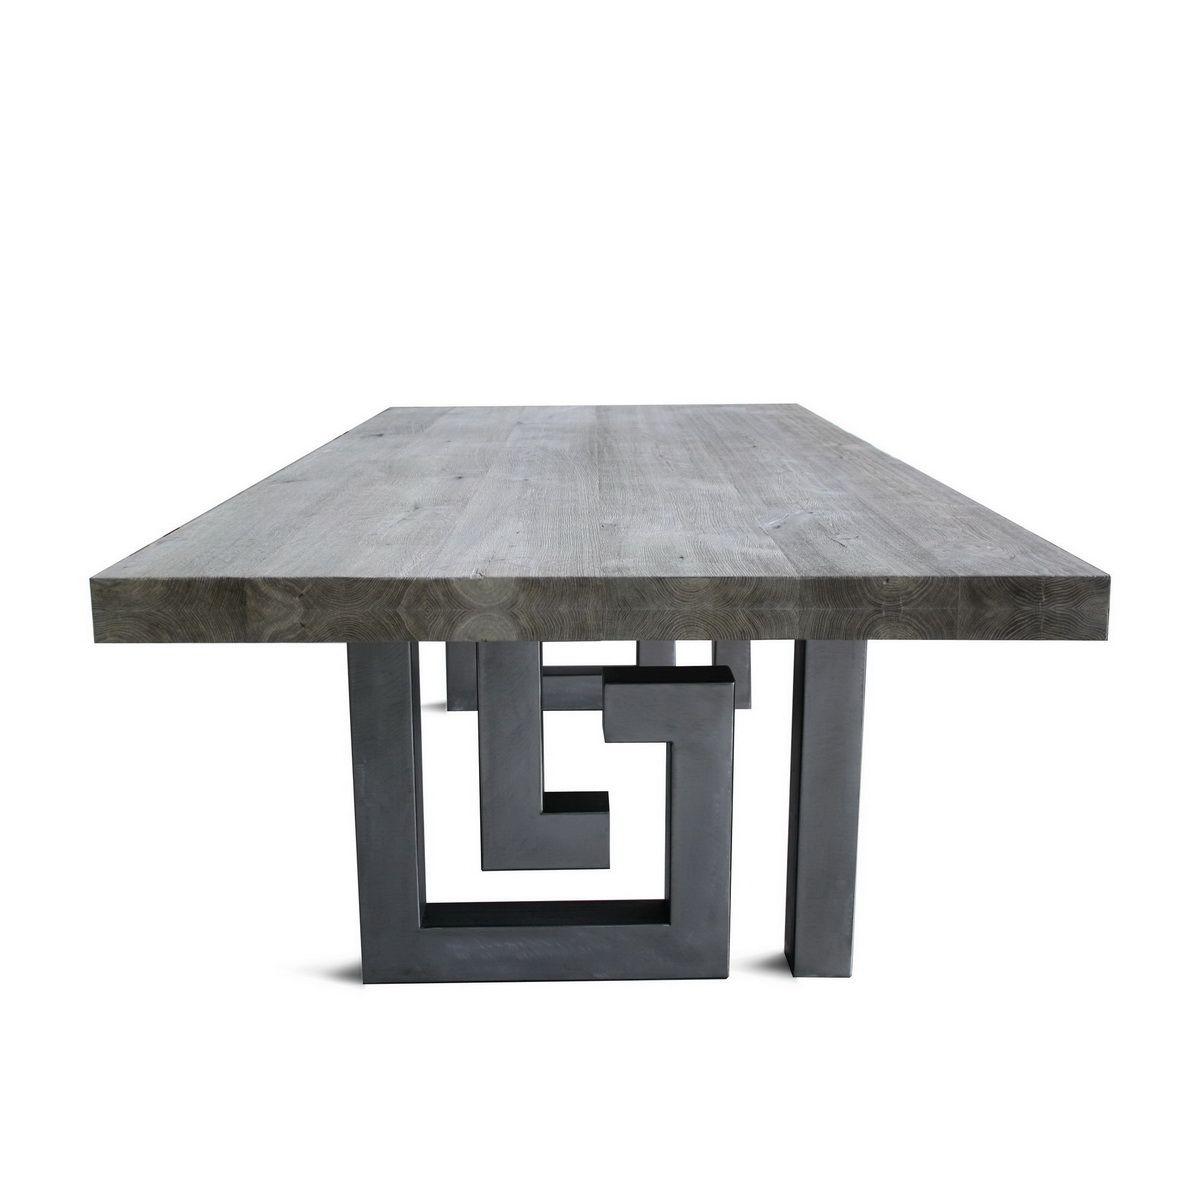 Emejing Table Metal Design Images Joshkrajcik Us Joshkrajcik Us # Meuble Design En Metal